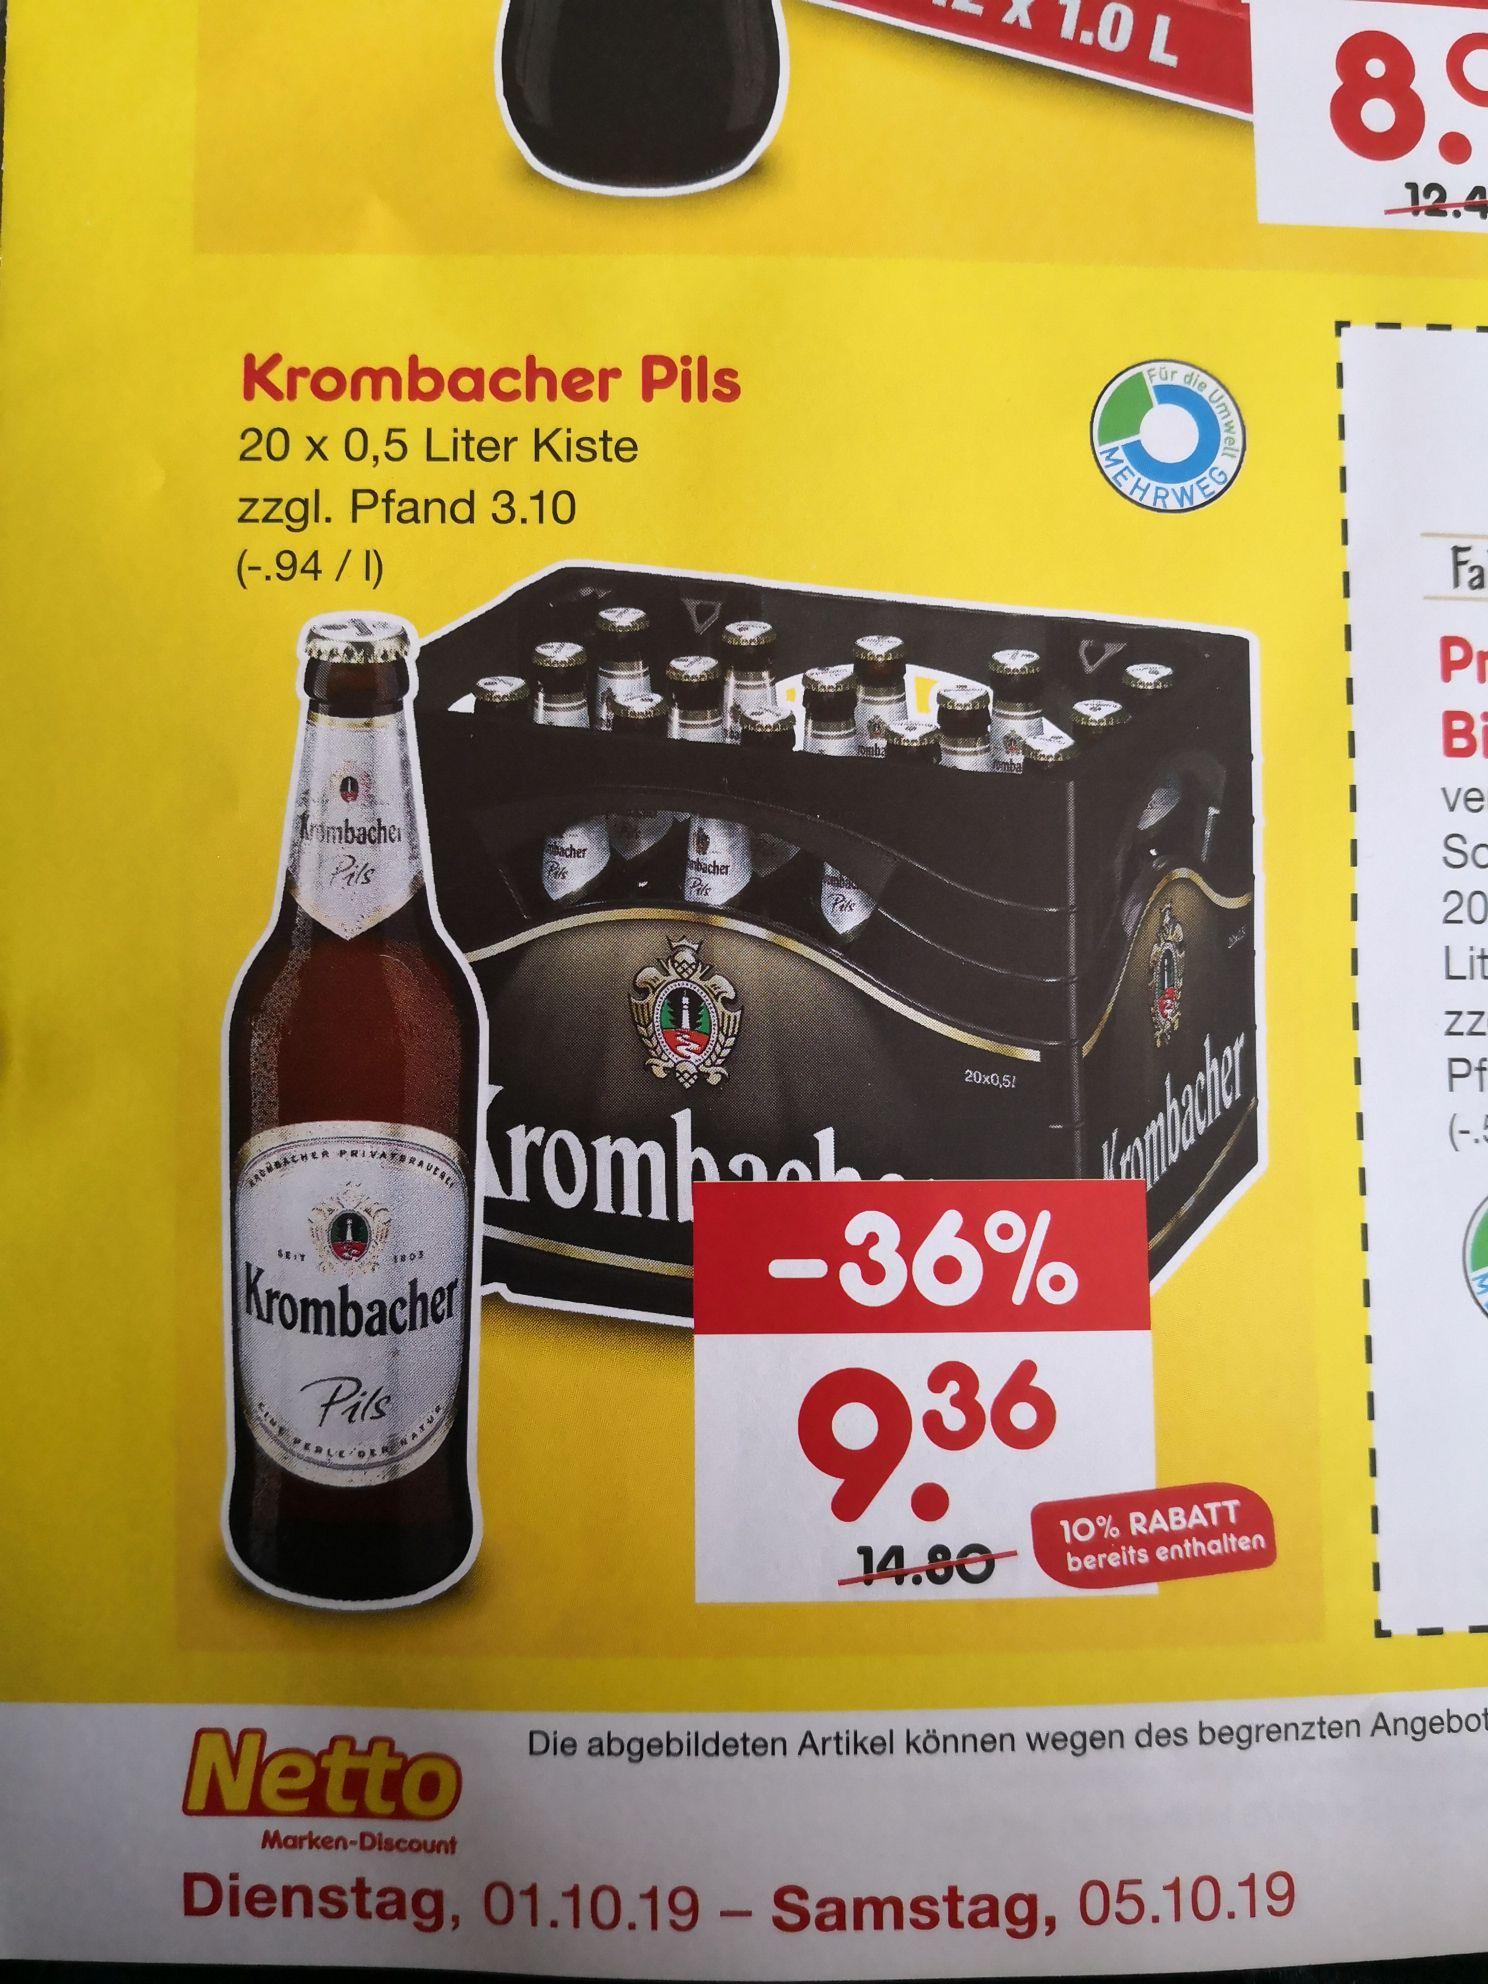 [Lokal Netto Kirchen-Sieg]  Krombacher Pils 20x0,5 Liter Kiste zzgl. Pfand für 9,36€,Coca Cola Kombikiste 8,09€  10% auf Alles*